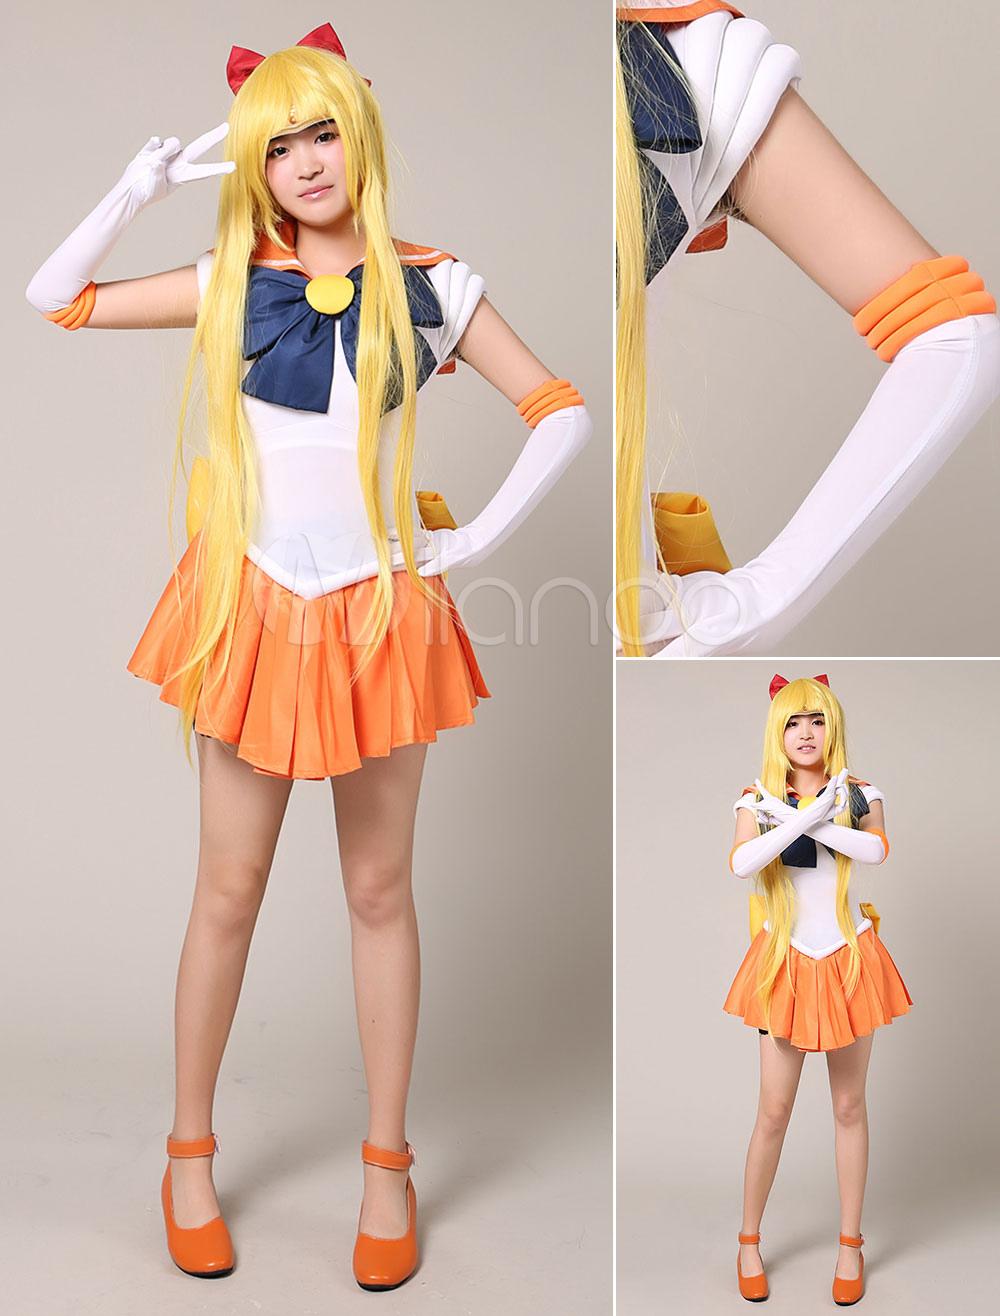 fc8db742cbe Shop cheap Sailor Moon costumes 2019